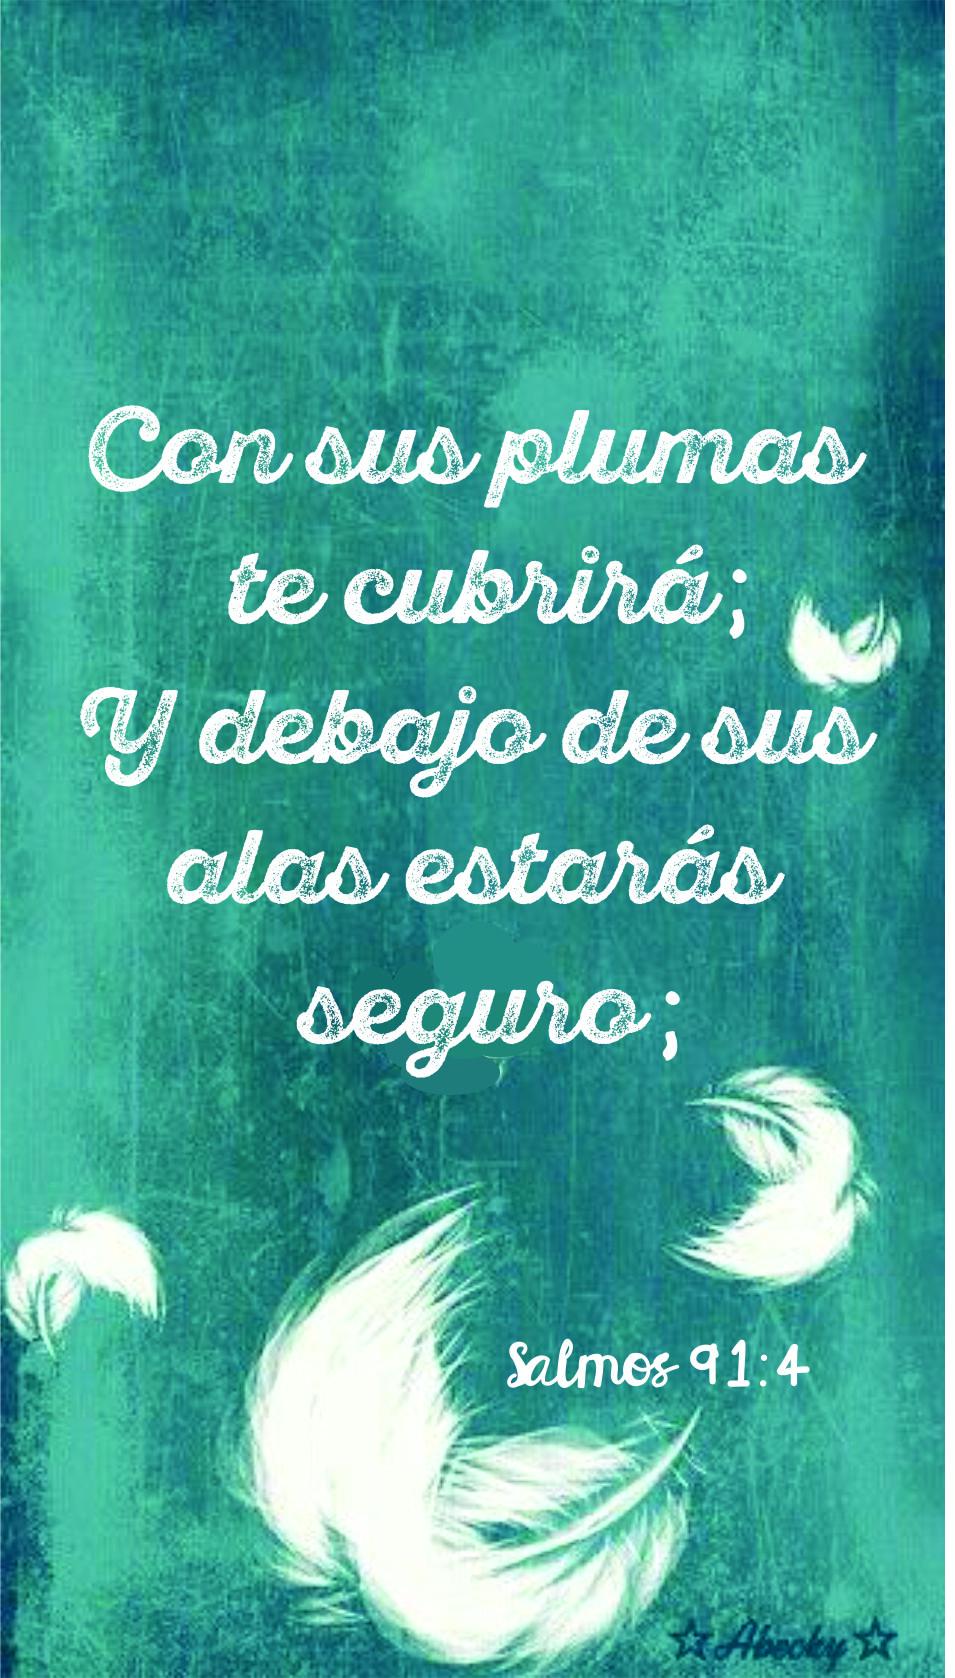 Con sus plumas te cubrirá... Salmo 91:4 | IMAGES | Pinterest | Trust ...